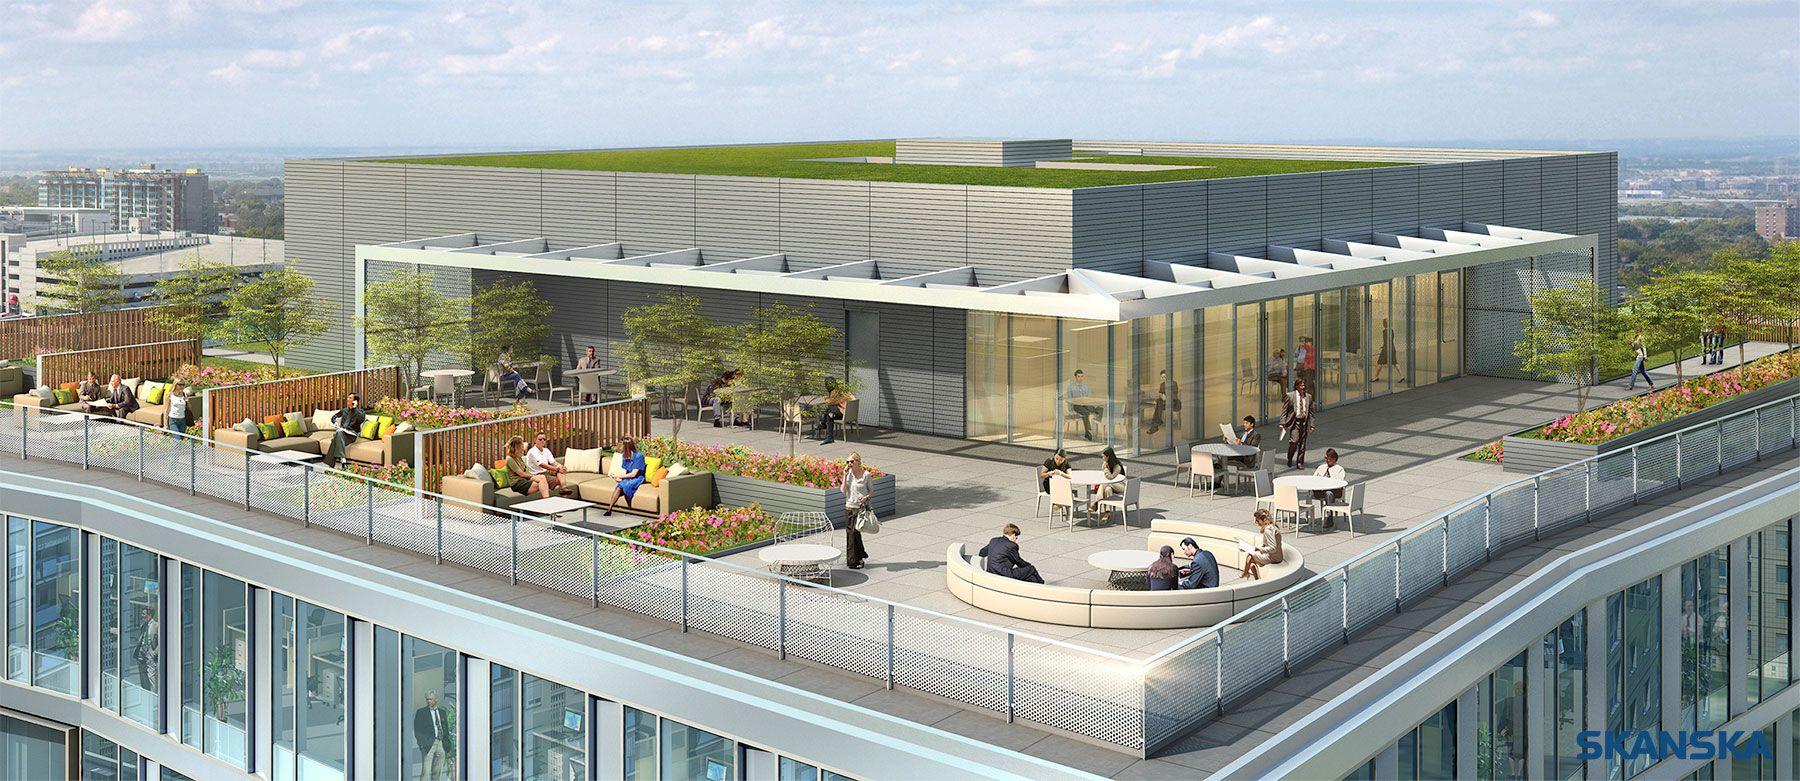 Roof Design Ideas: Pin By Tristan Walker On NODE